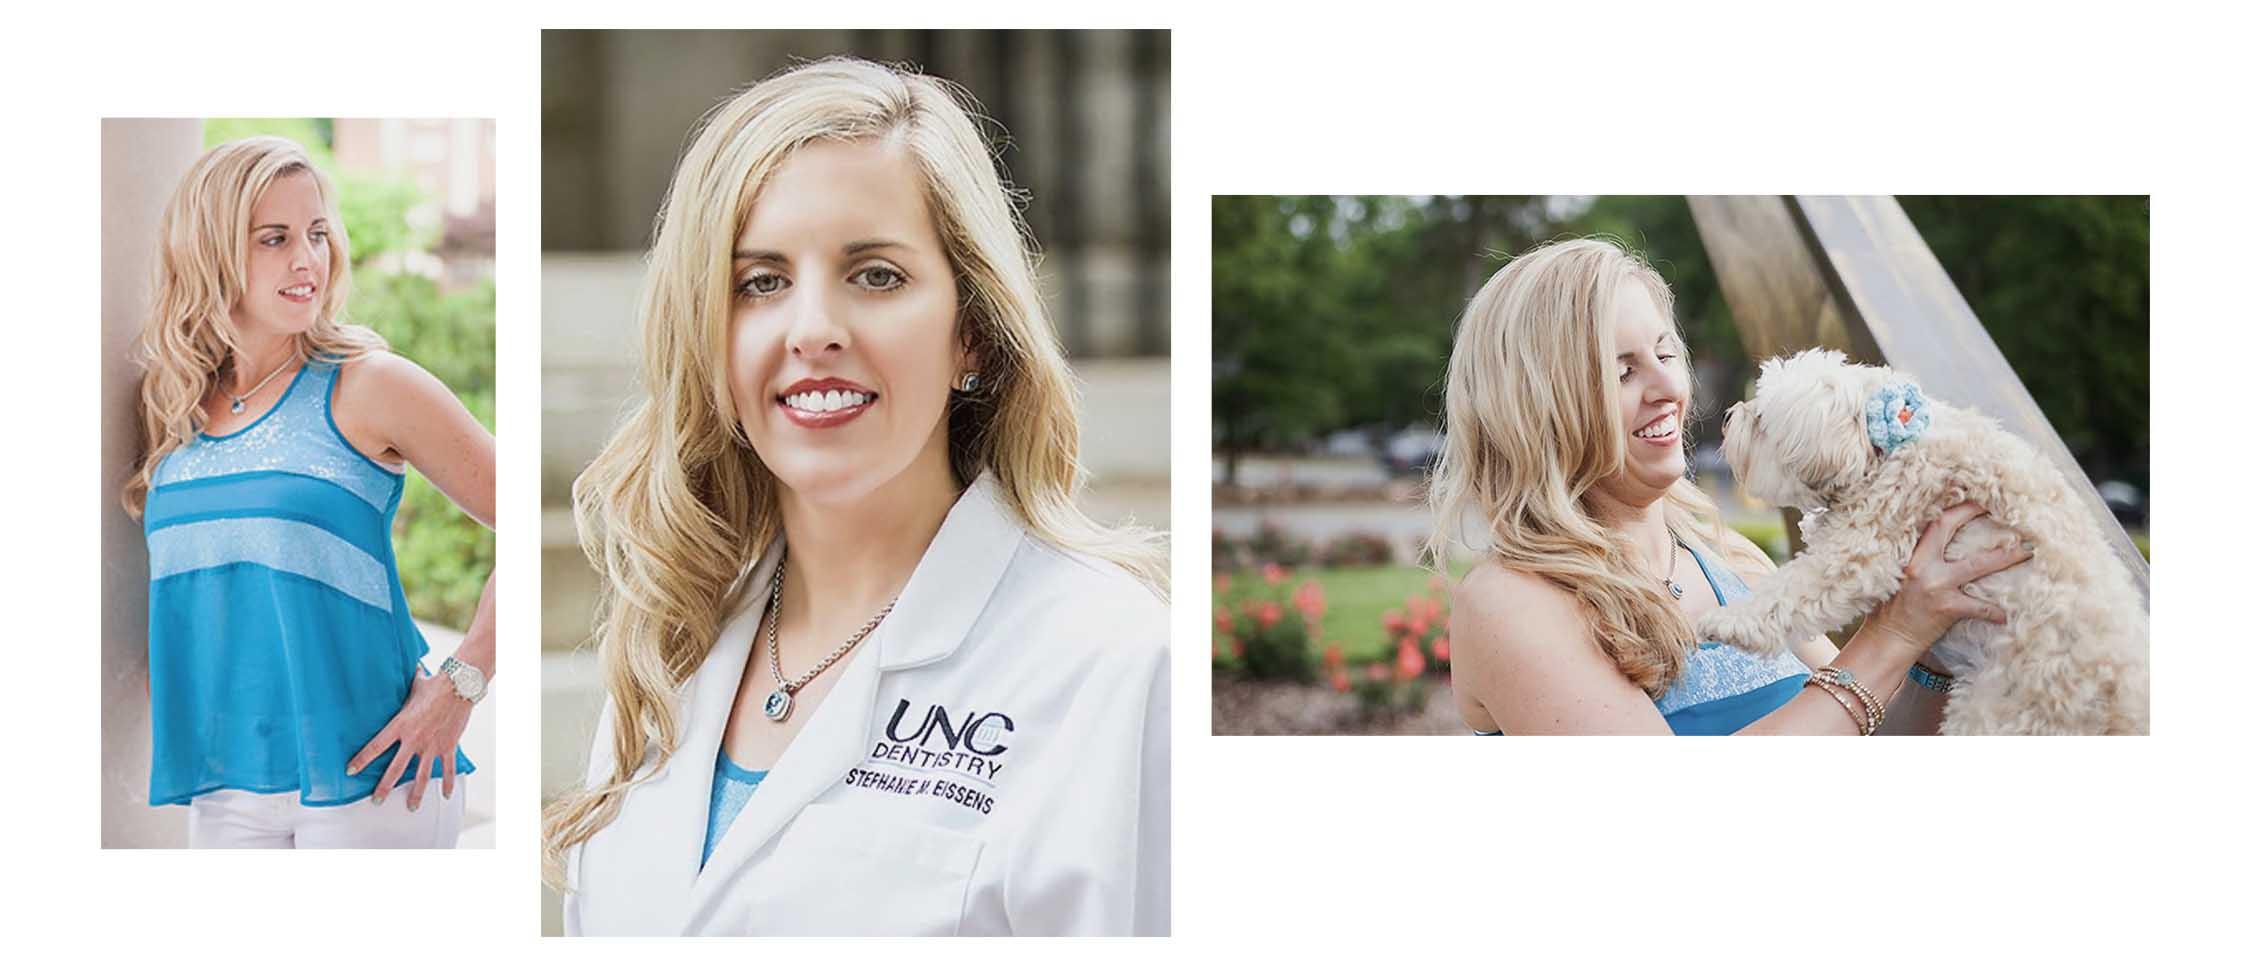 Dr. Stephanie Eissens